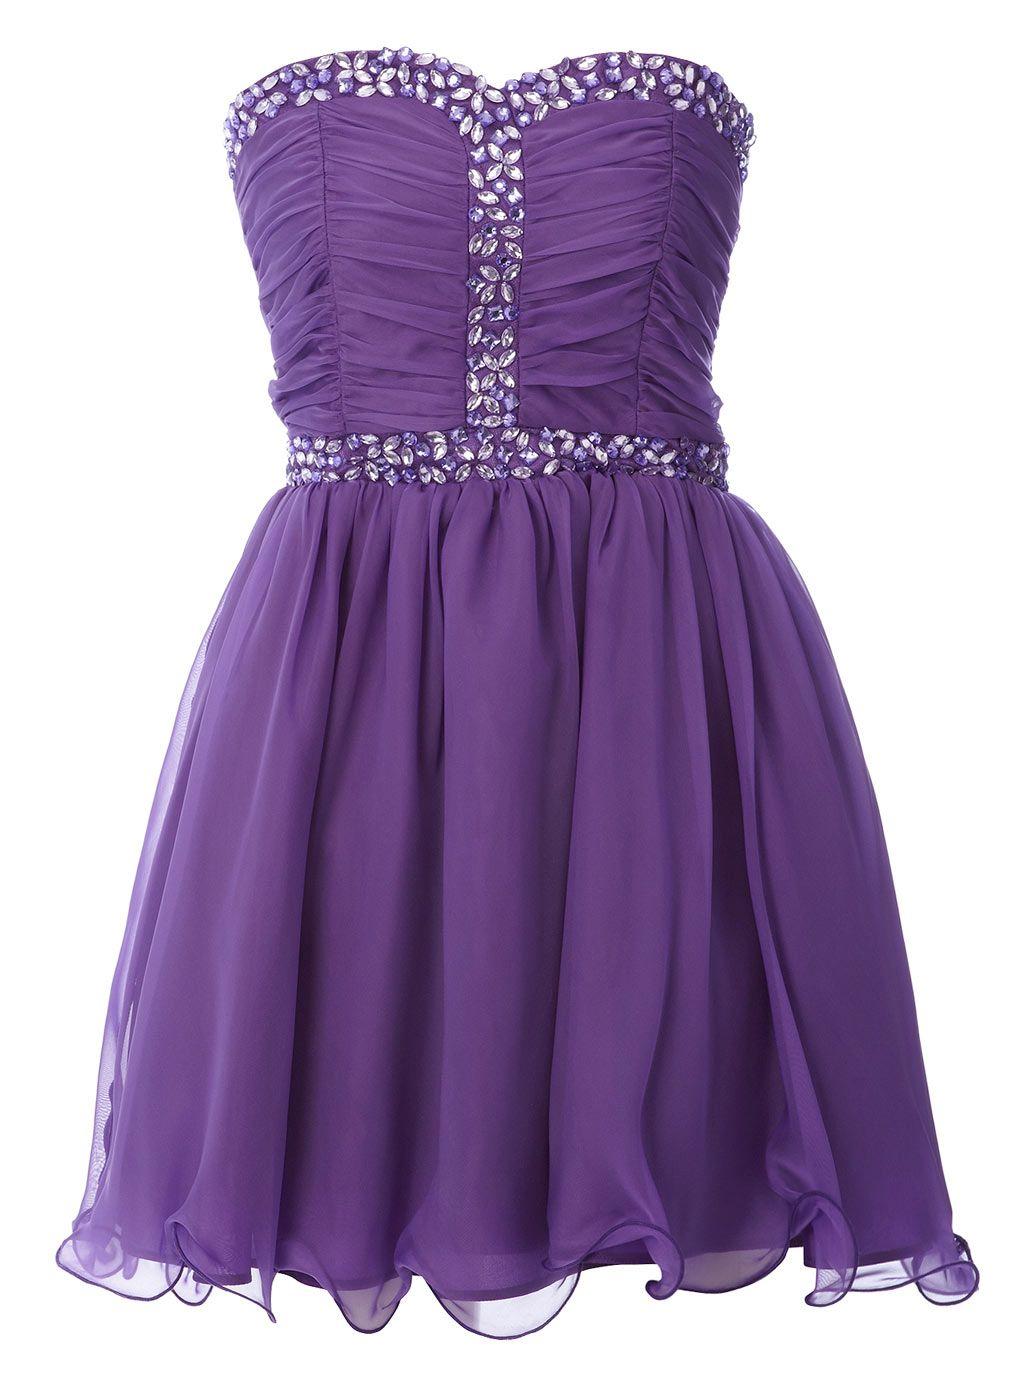 Purple Silky Chiffon Gem Trim Dress - prom dresses - dresses - older ...